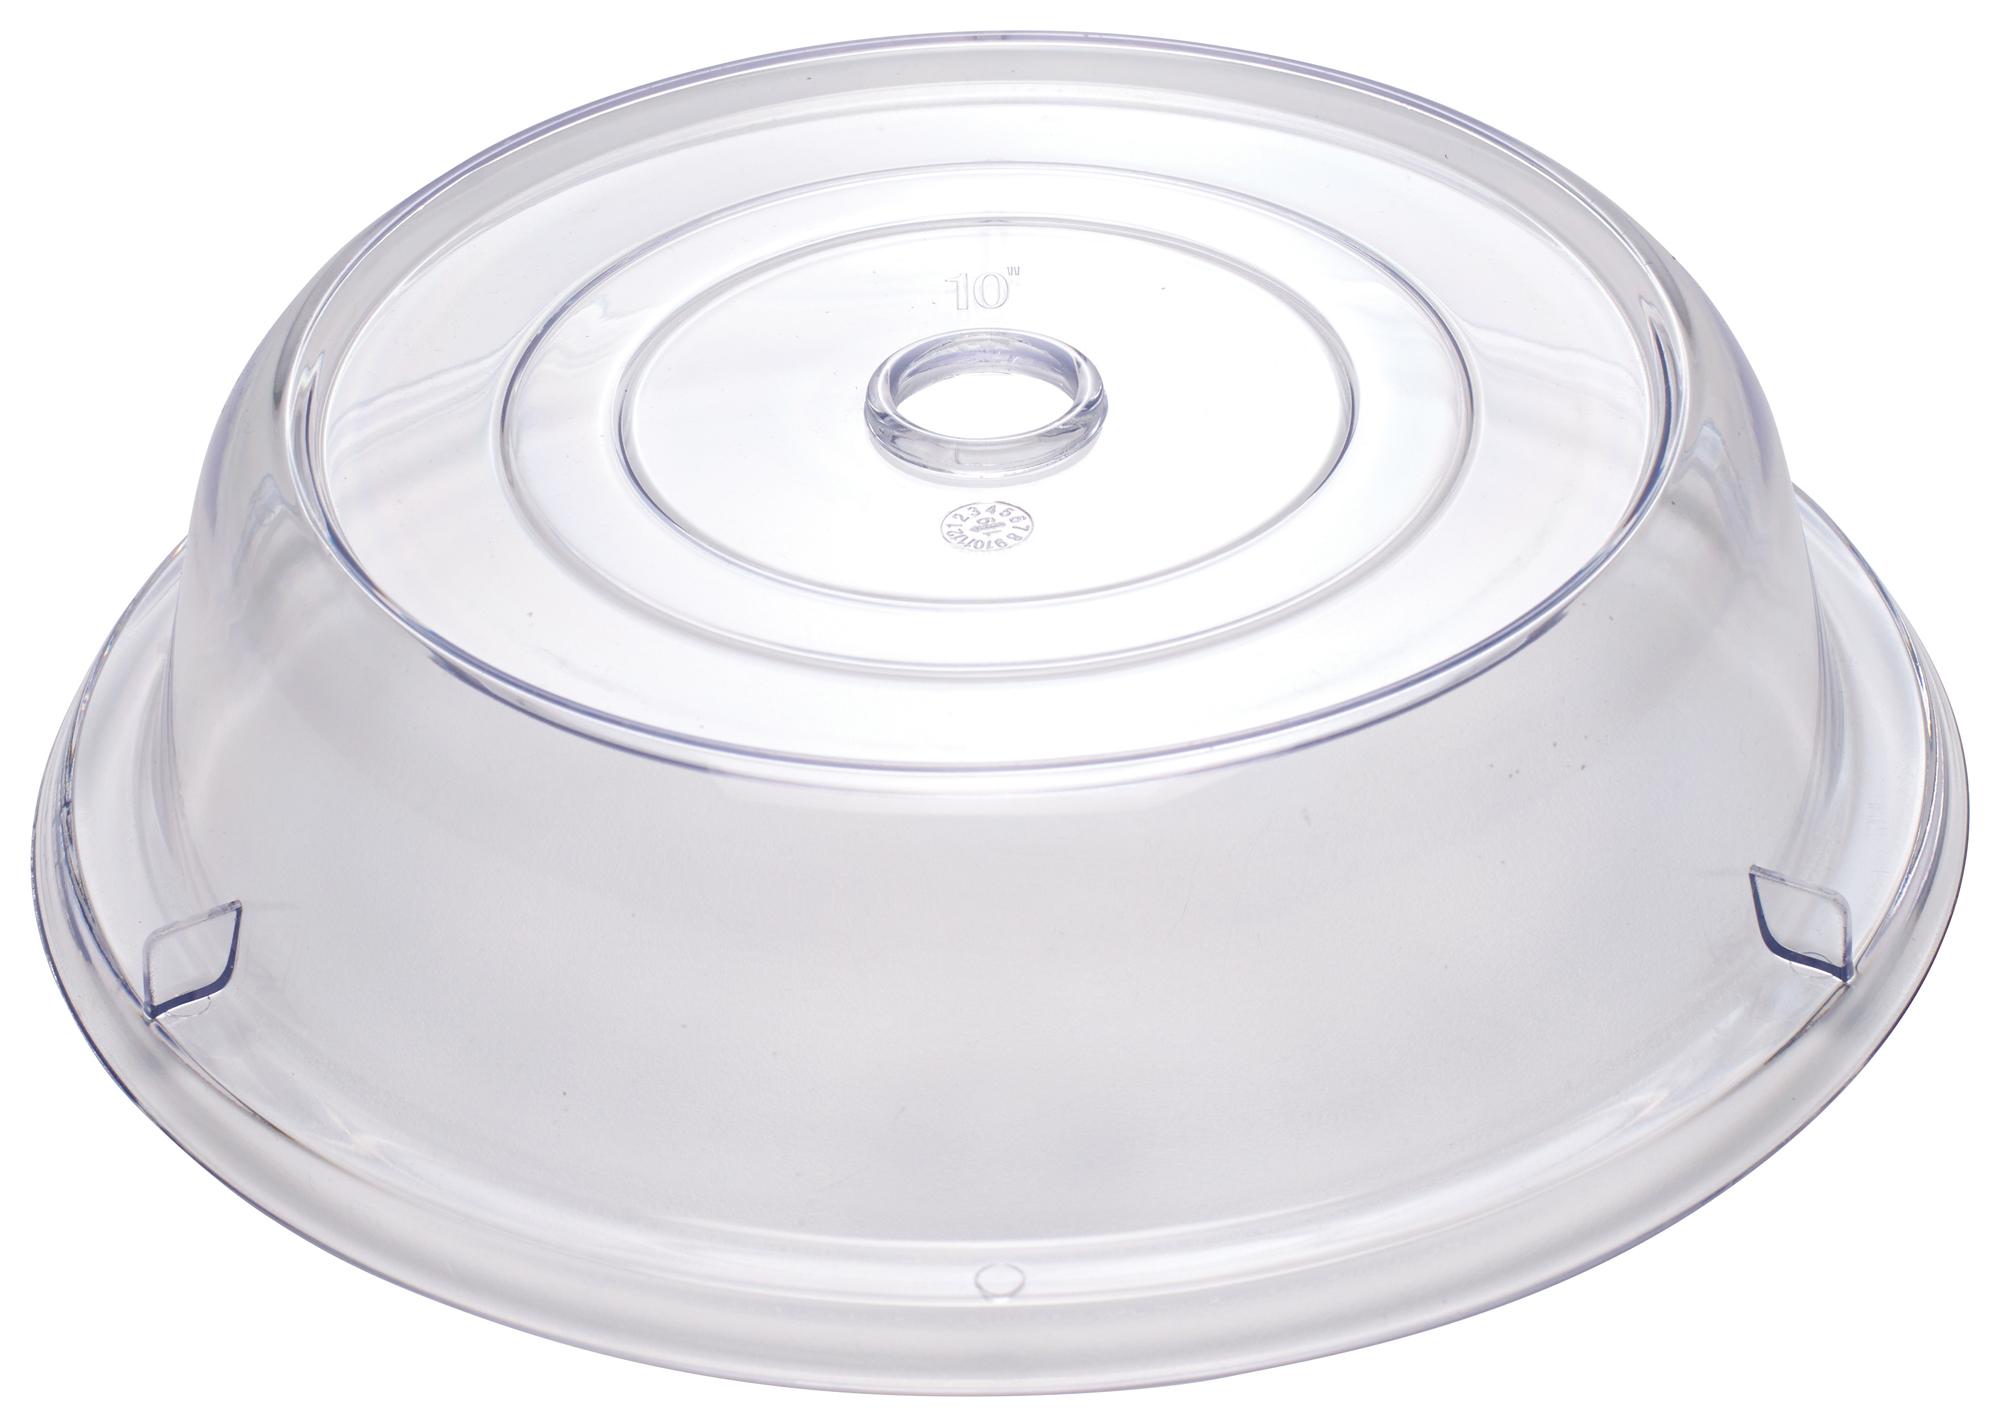 Winco PPCR-10 round plate cover